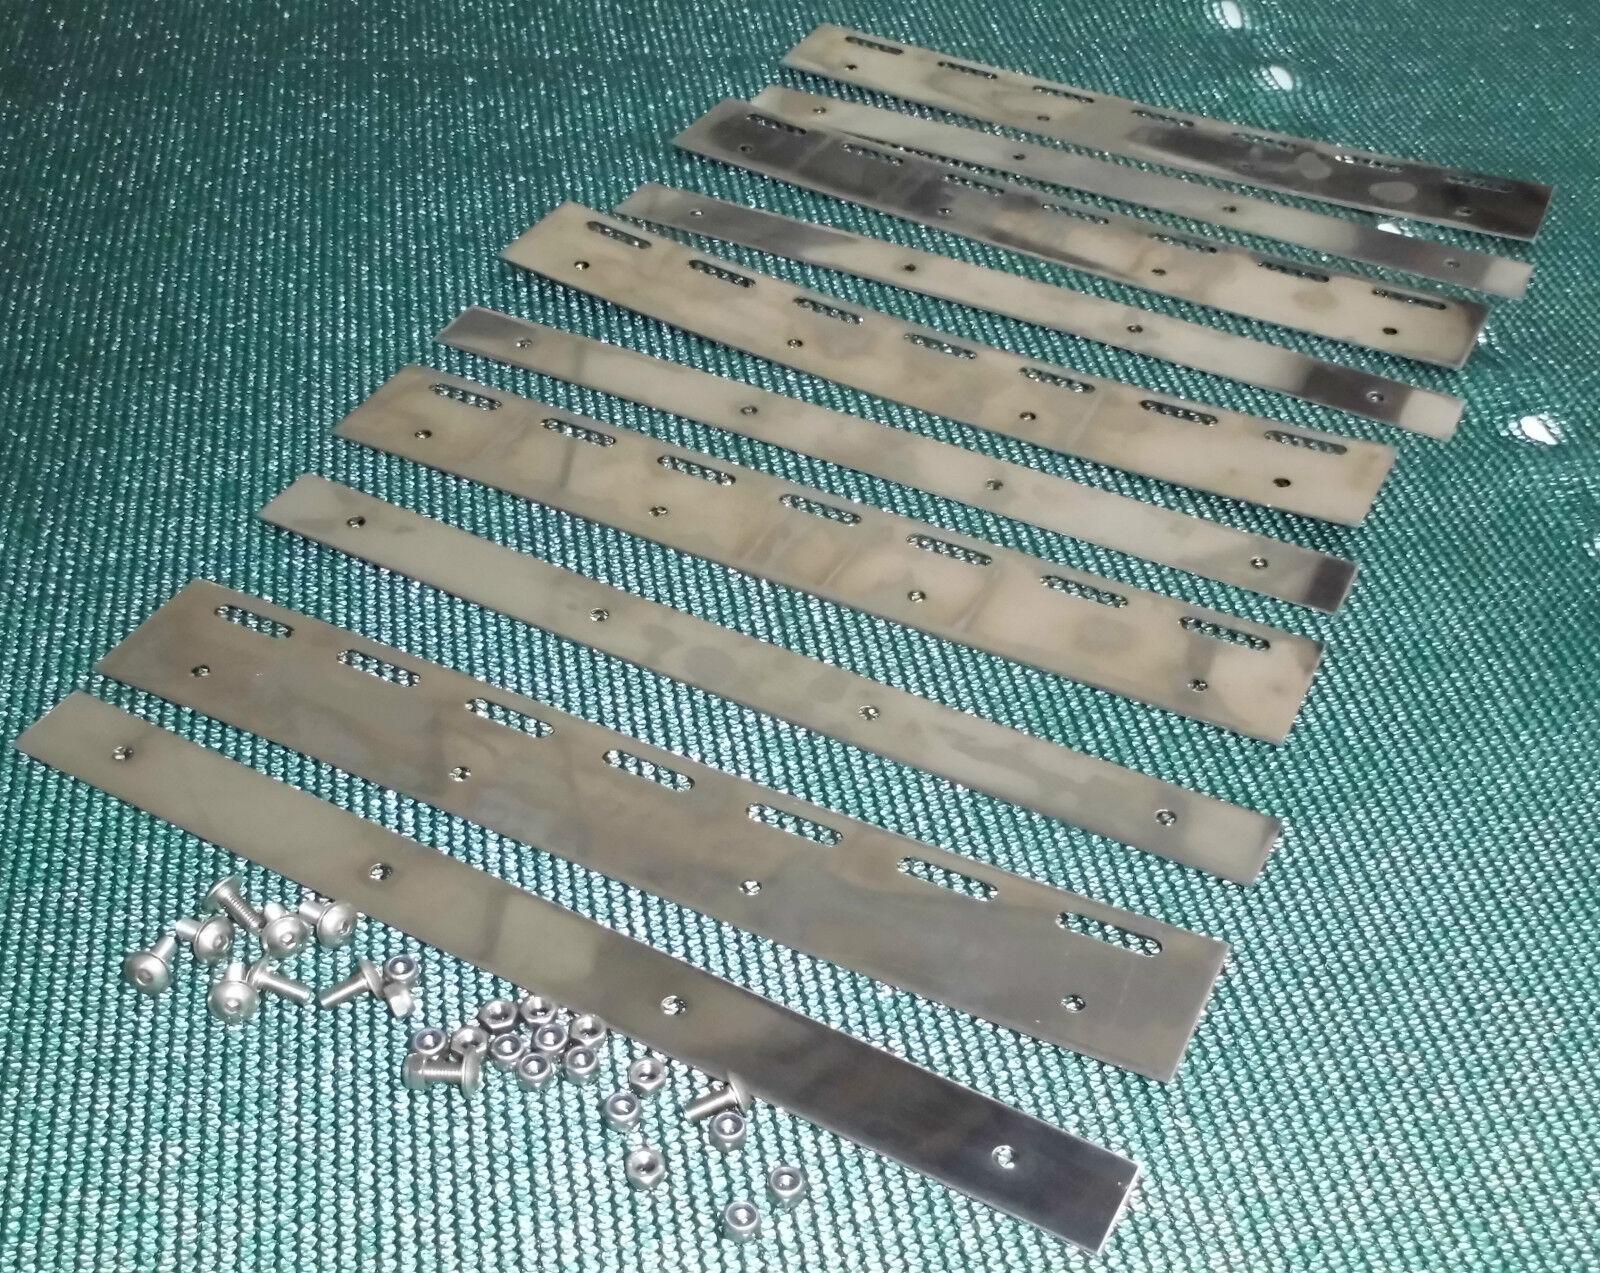 15 St. sustituto befestigunsplatten pendelplatten para PVC-cortina de lamas 30 cm